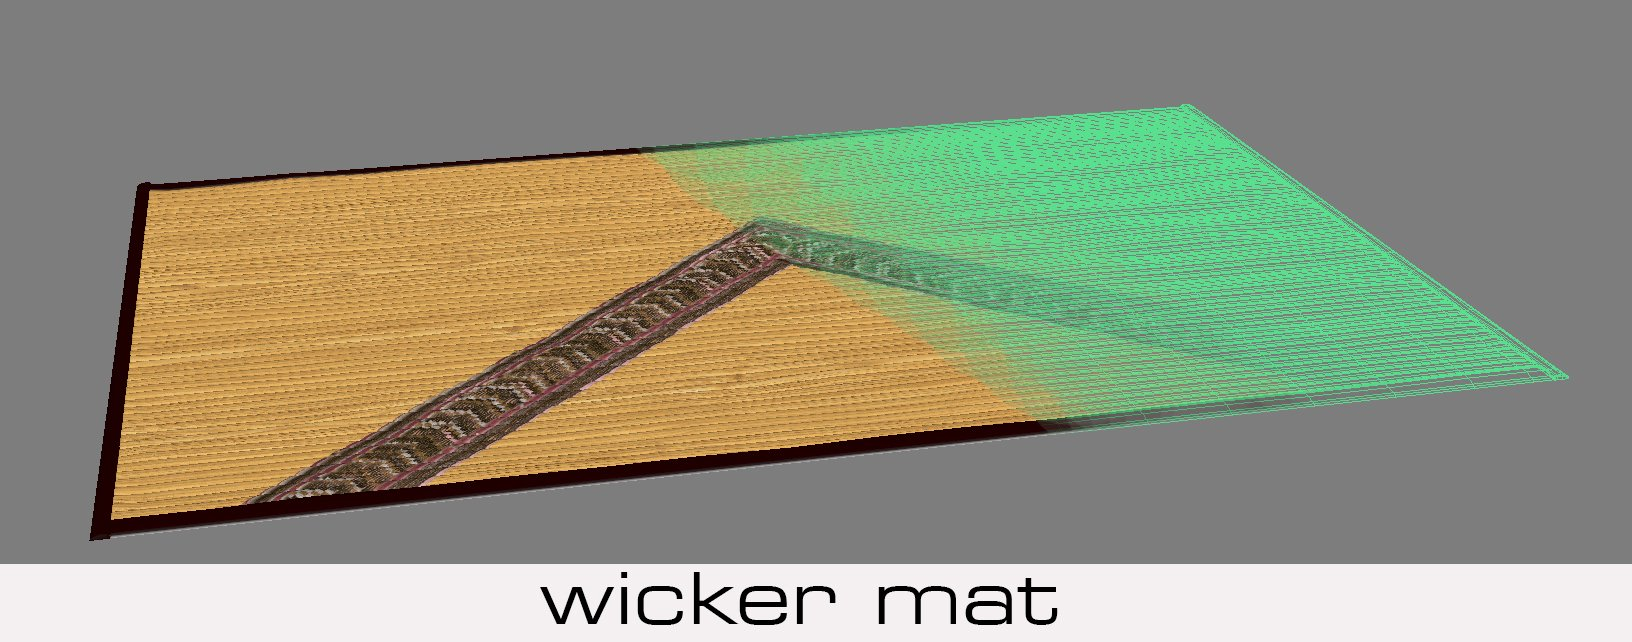 items_10_wicker_mat_900_01055.jpg